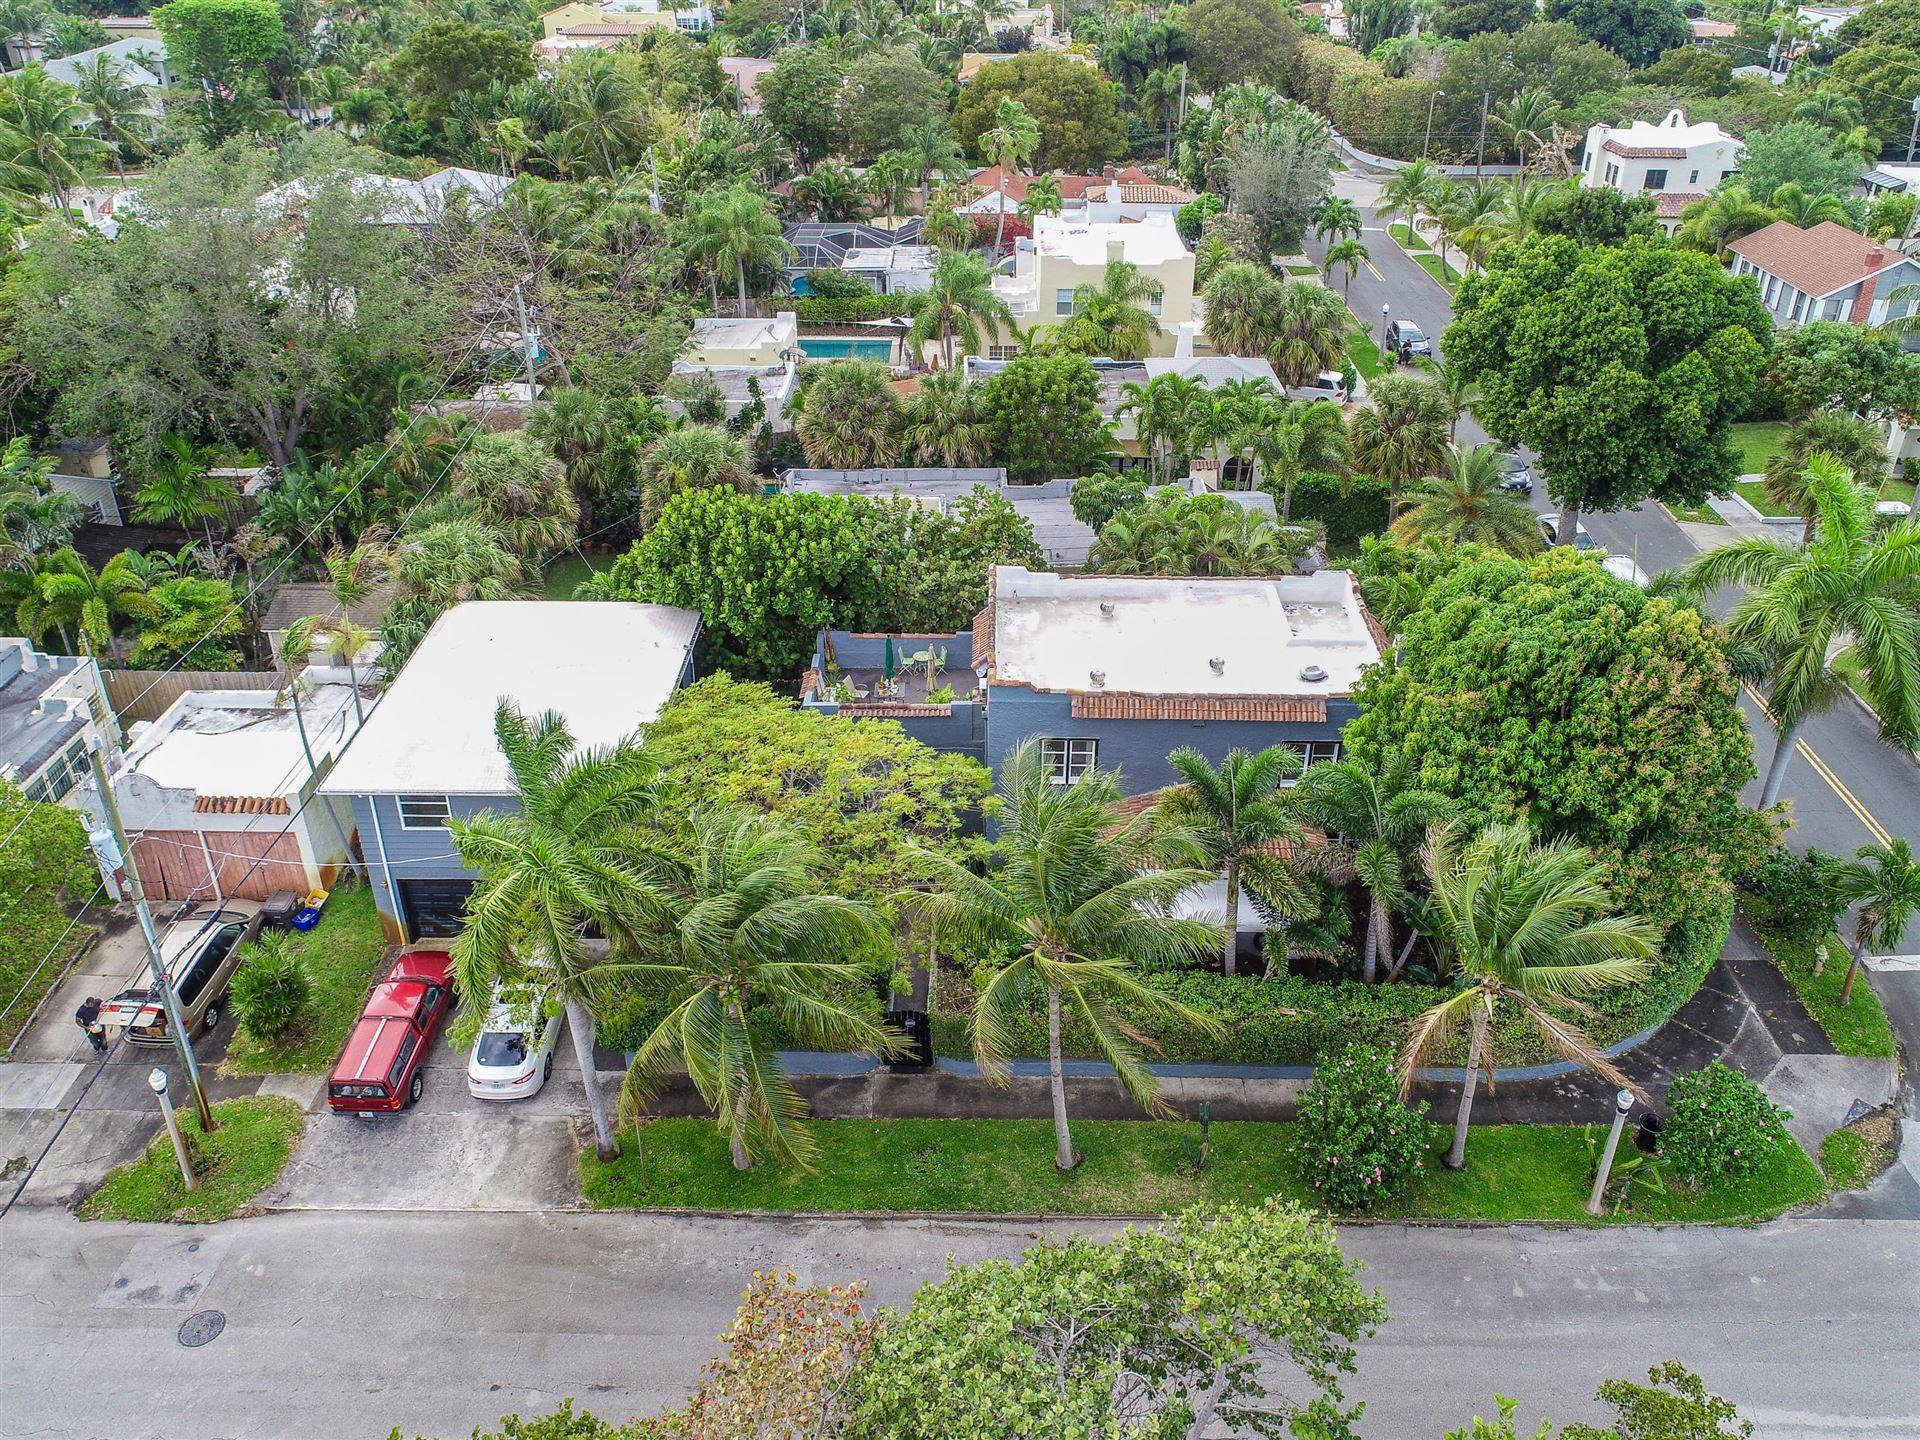 600 Biscayne Drive, West Palm Beach, FL 33401 - #: RX-10605025